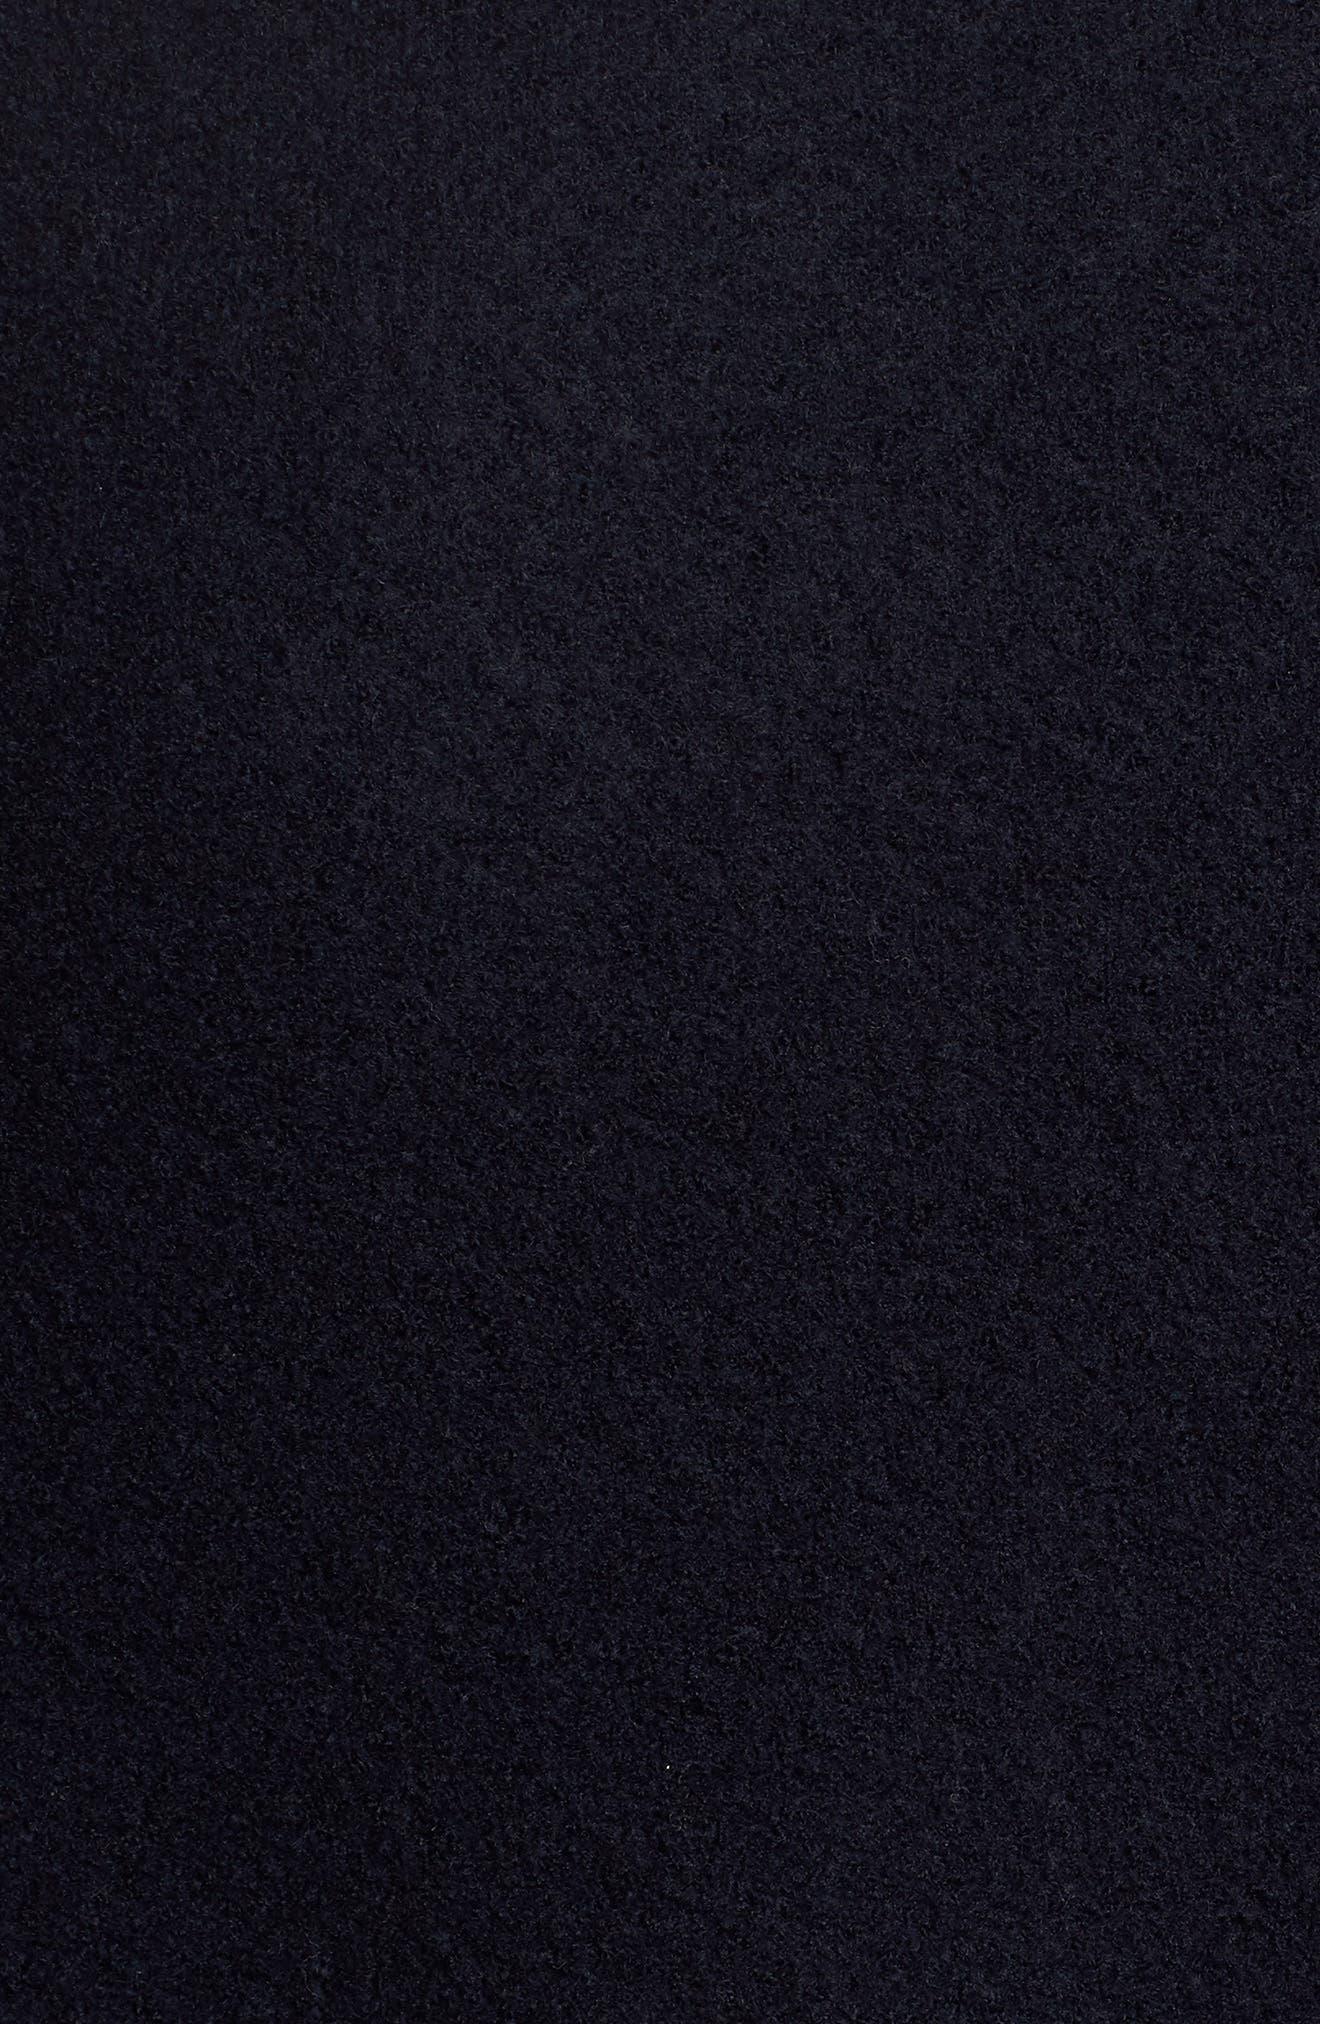 Felted Wool Bomber Jacket,                             Alternate thumbnail 6, color,                             BLUE GRAPHITE